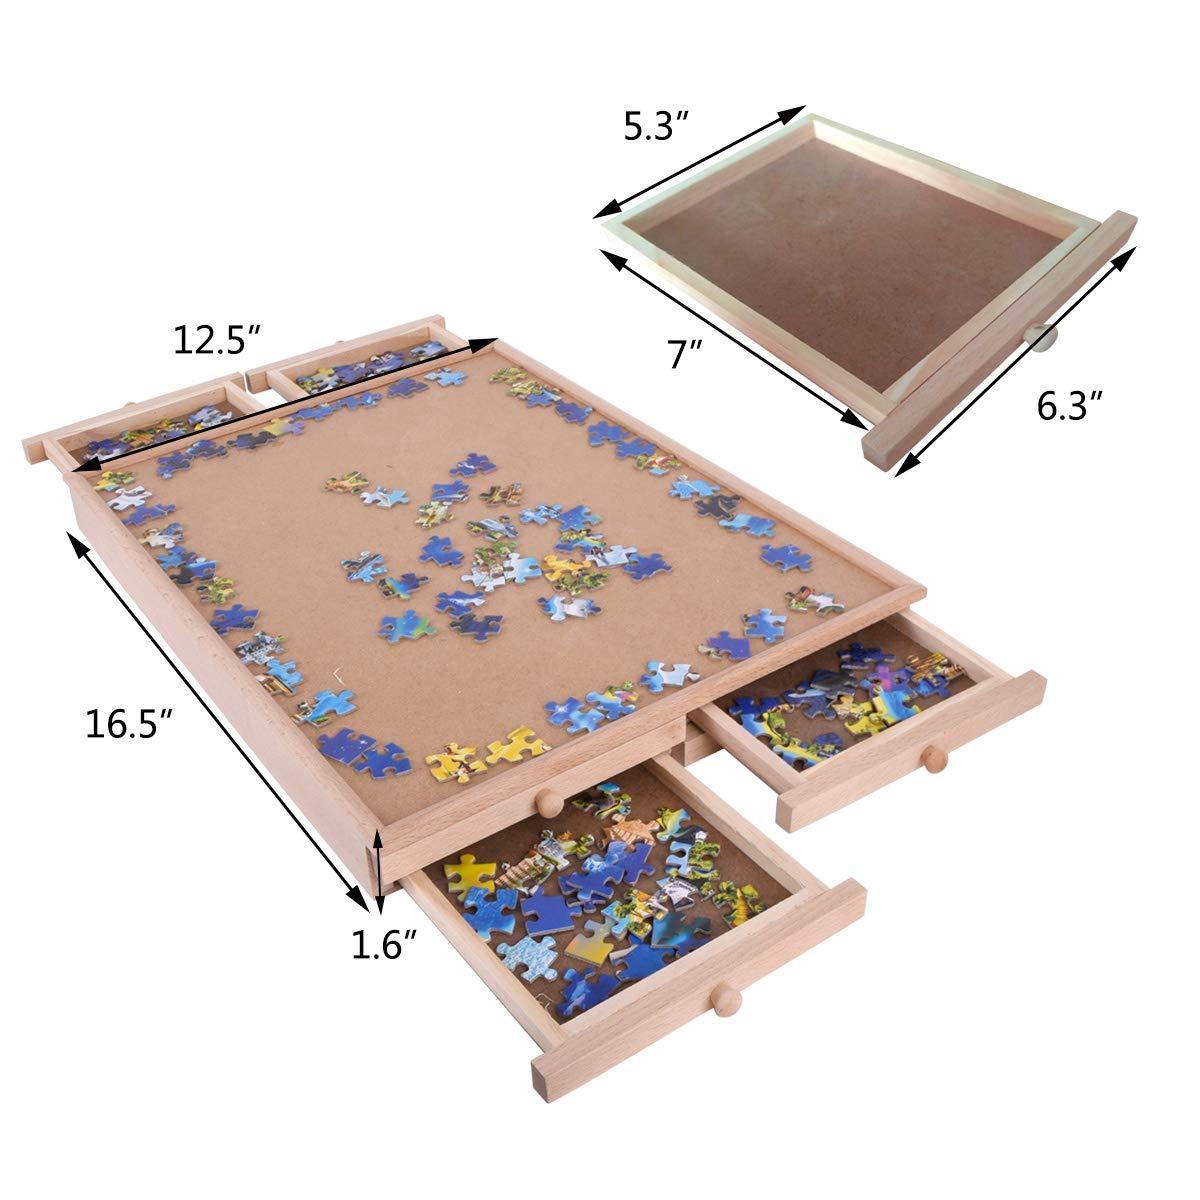 Vencer Wooden Puzzle Storage- 8 Sliding Drawers System by Vencer